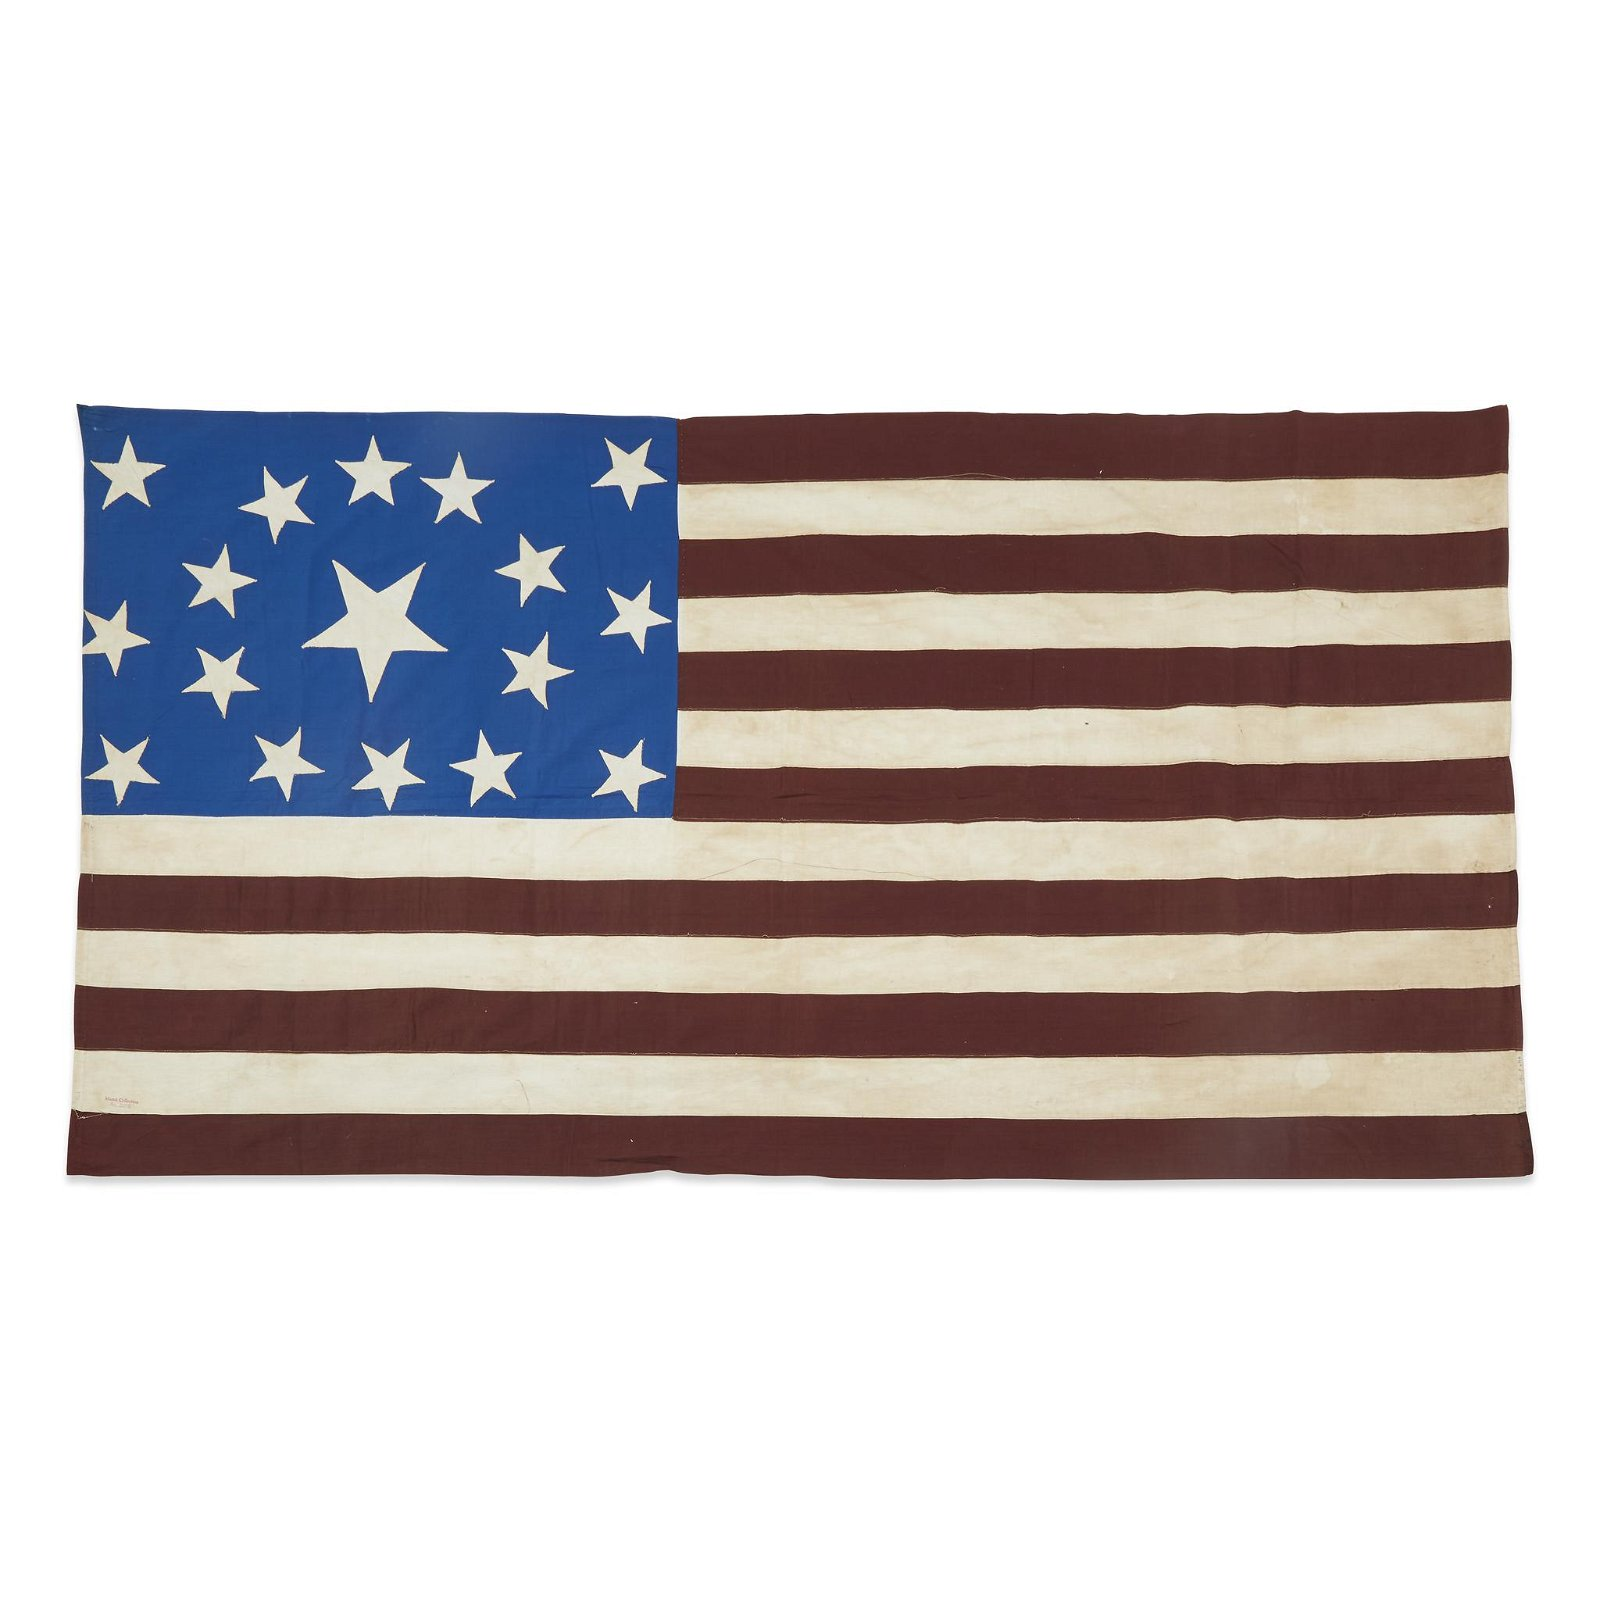 A 17-Star American Flag commemorating Ohio statehood,